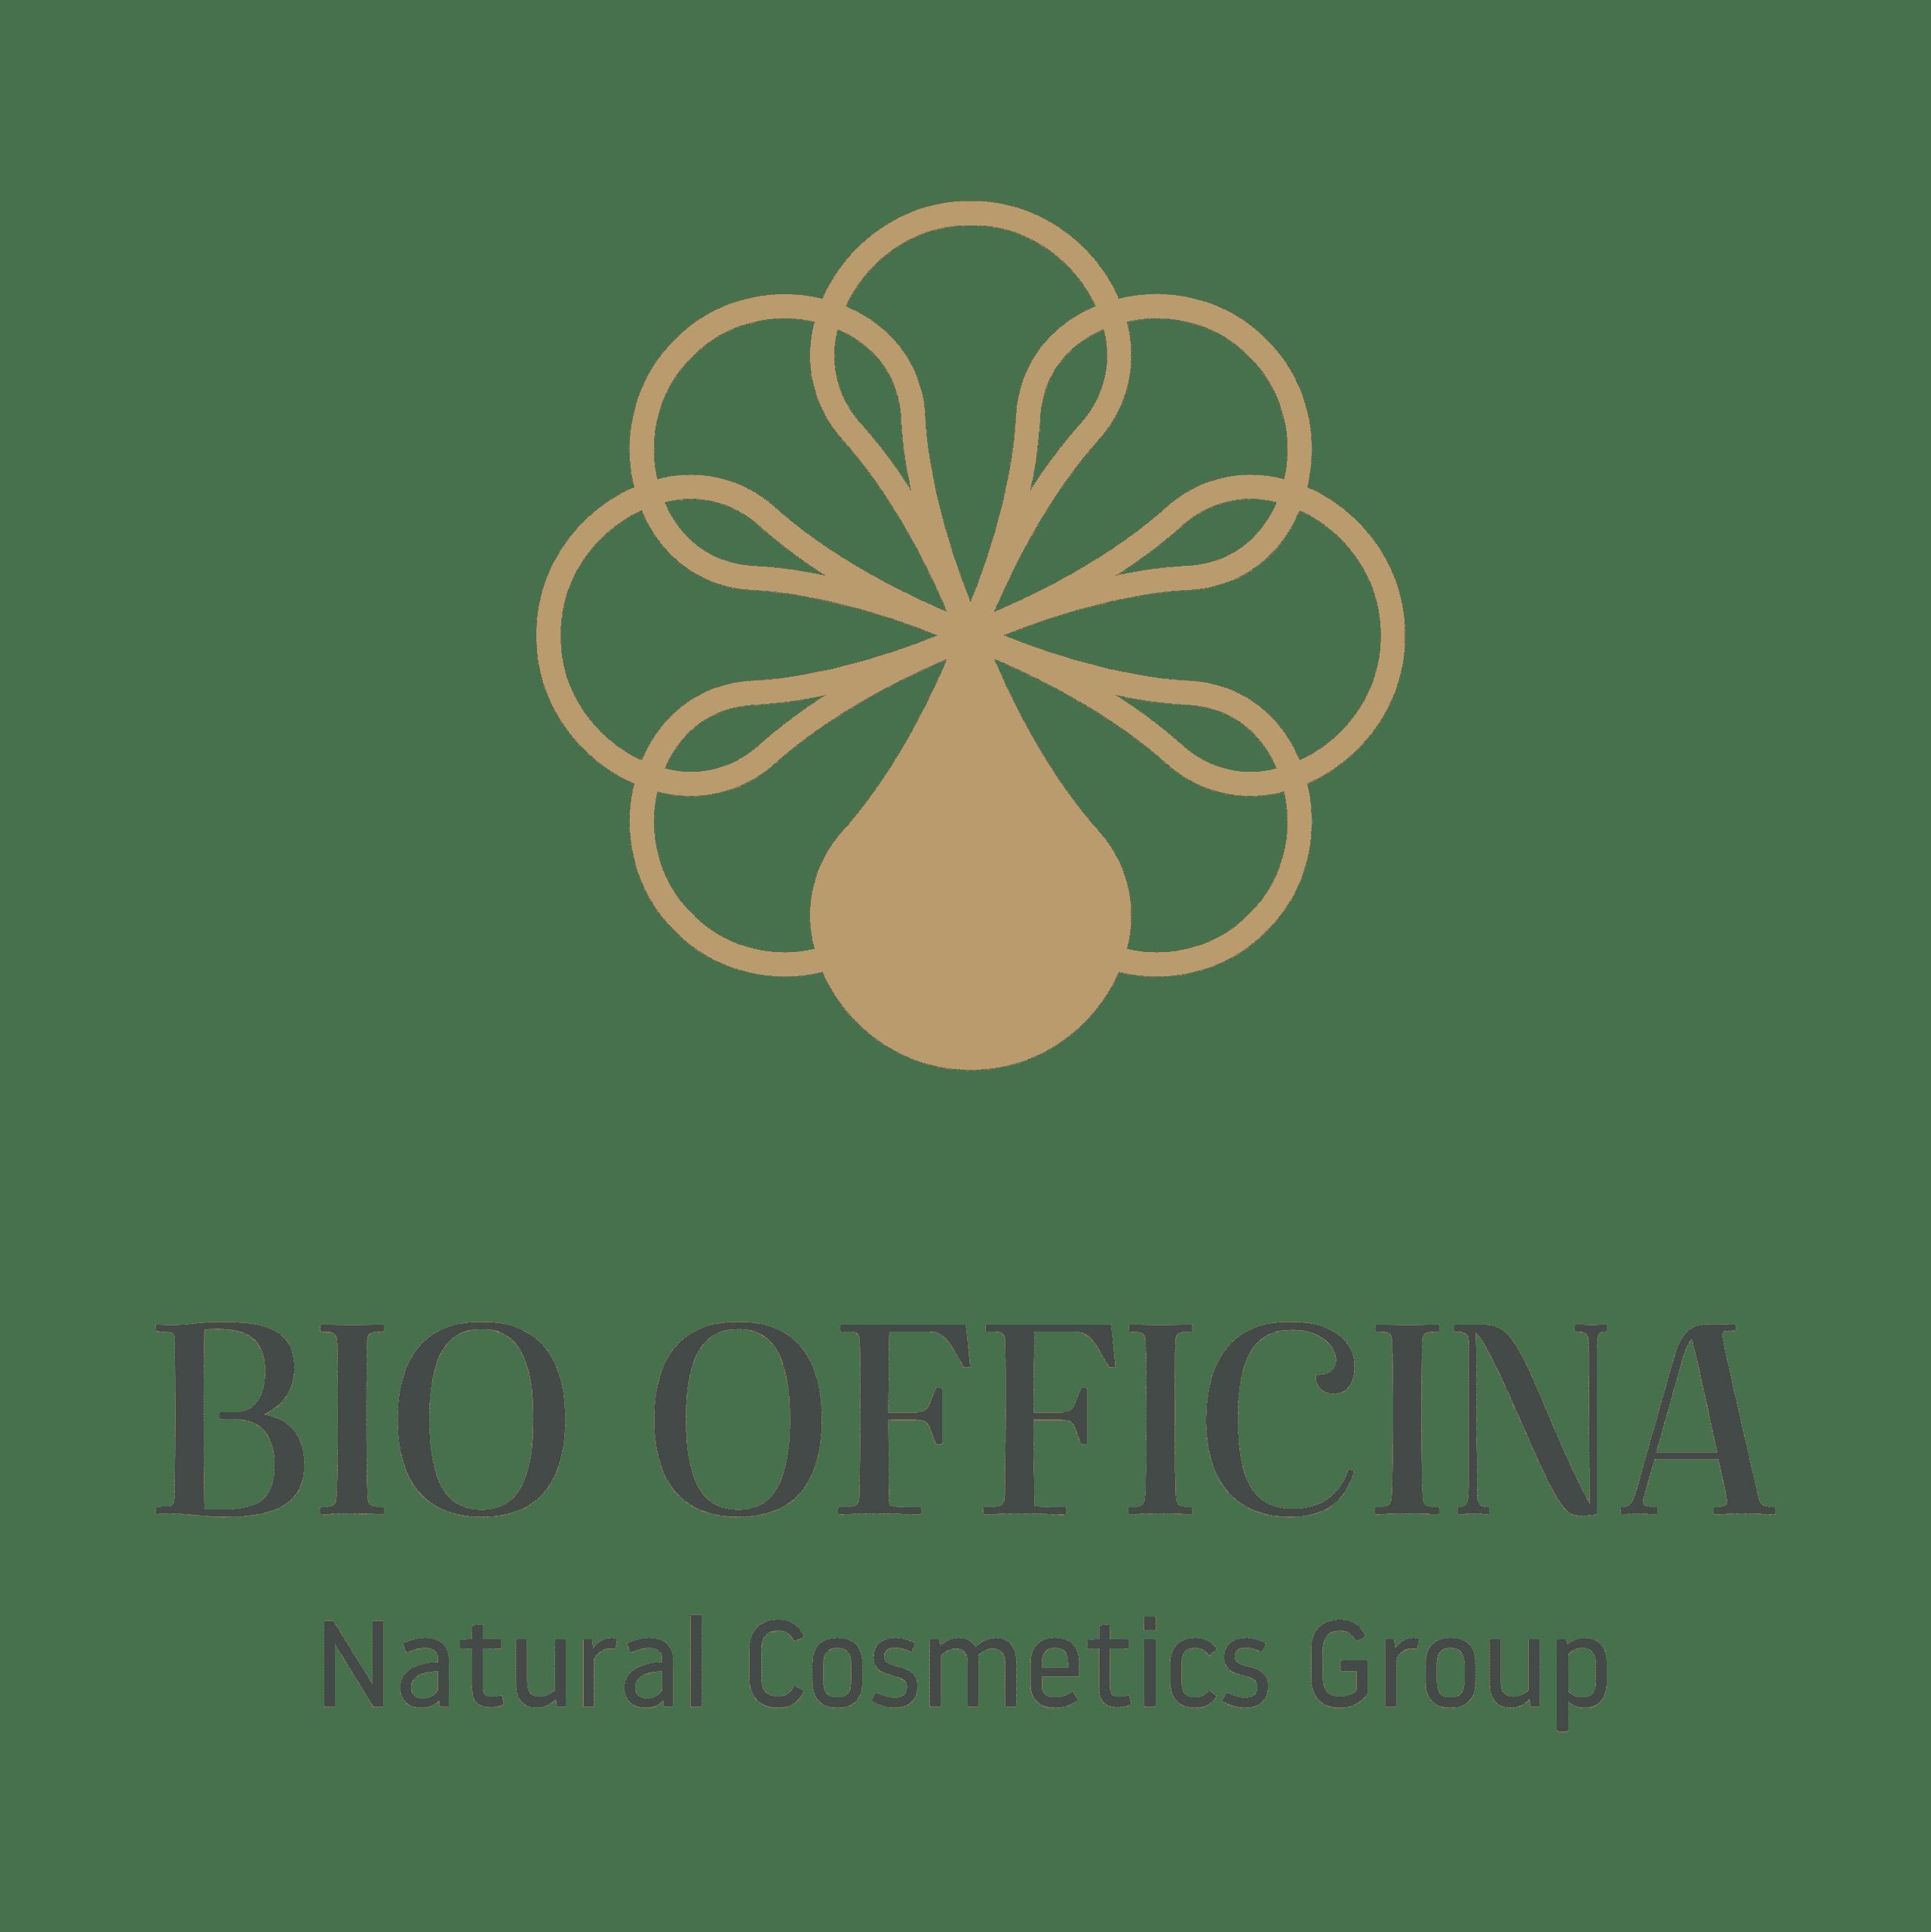 Bio Officina